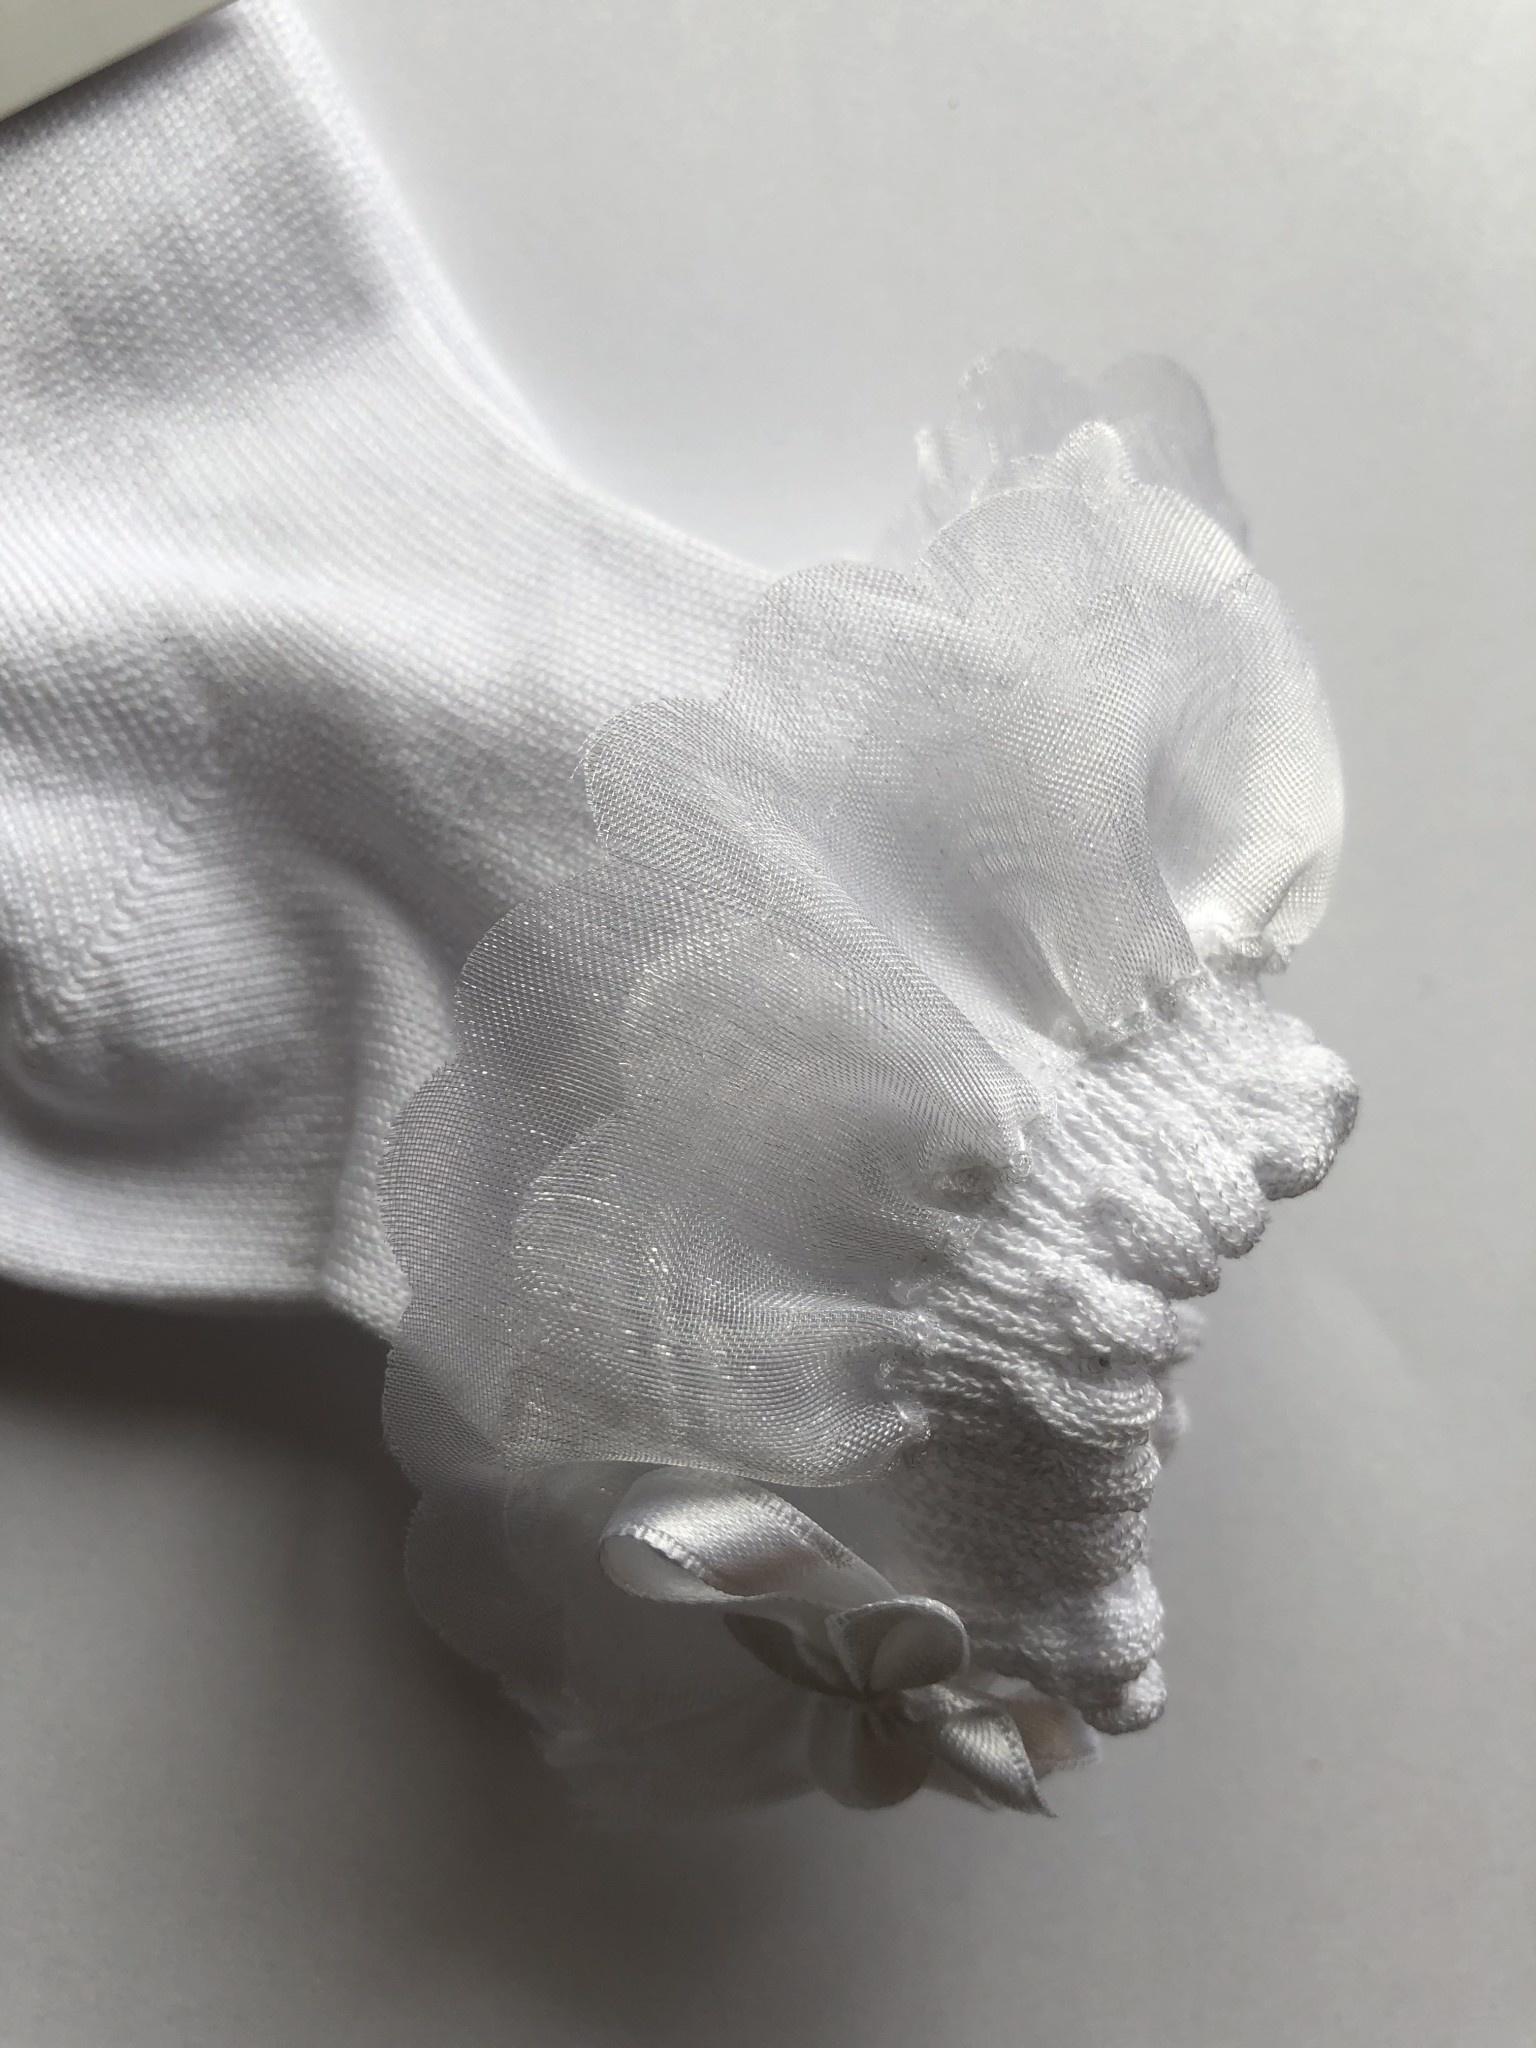 JC Socks JC Socks White Ankle Sock, Chiffon Ruffle with Bow